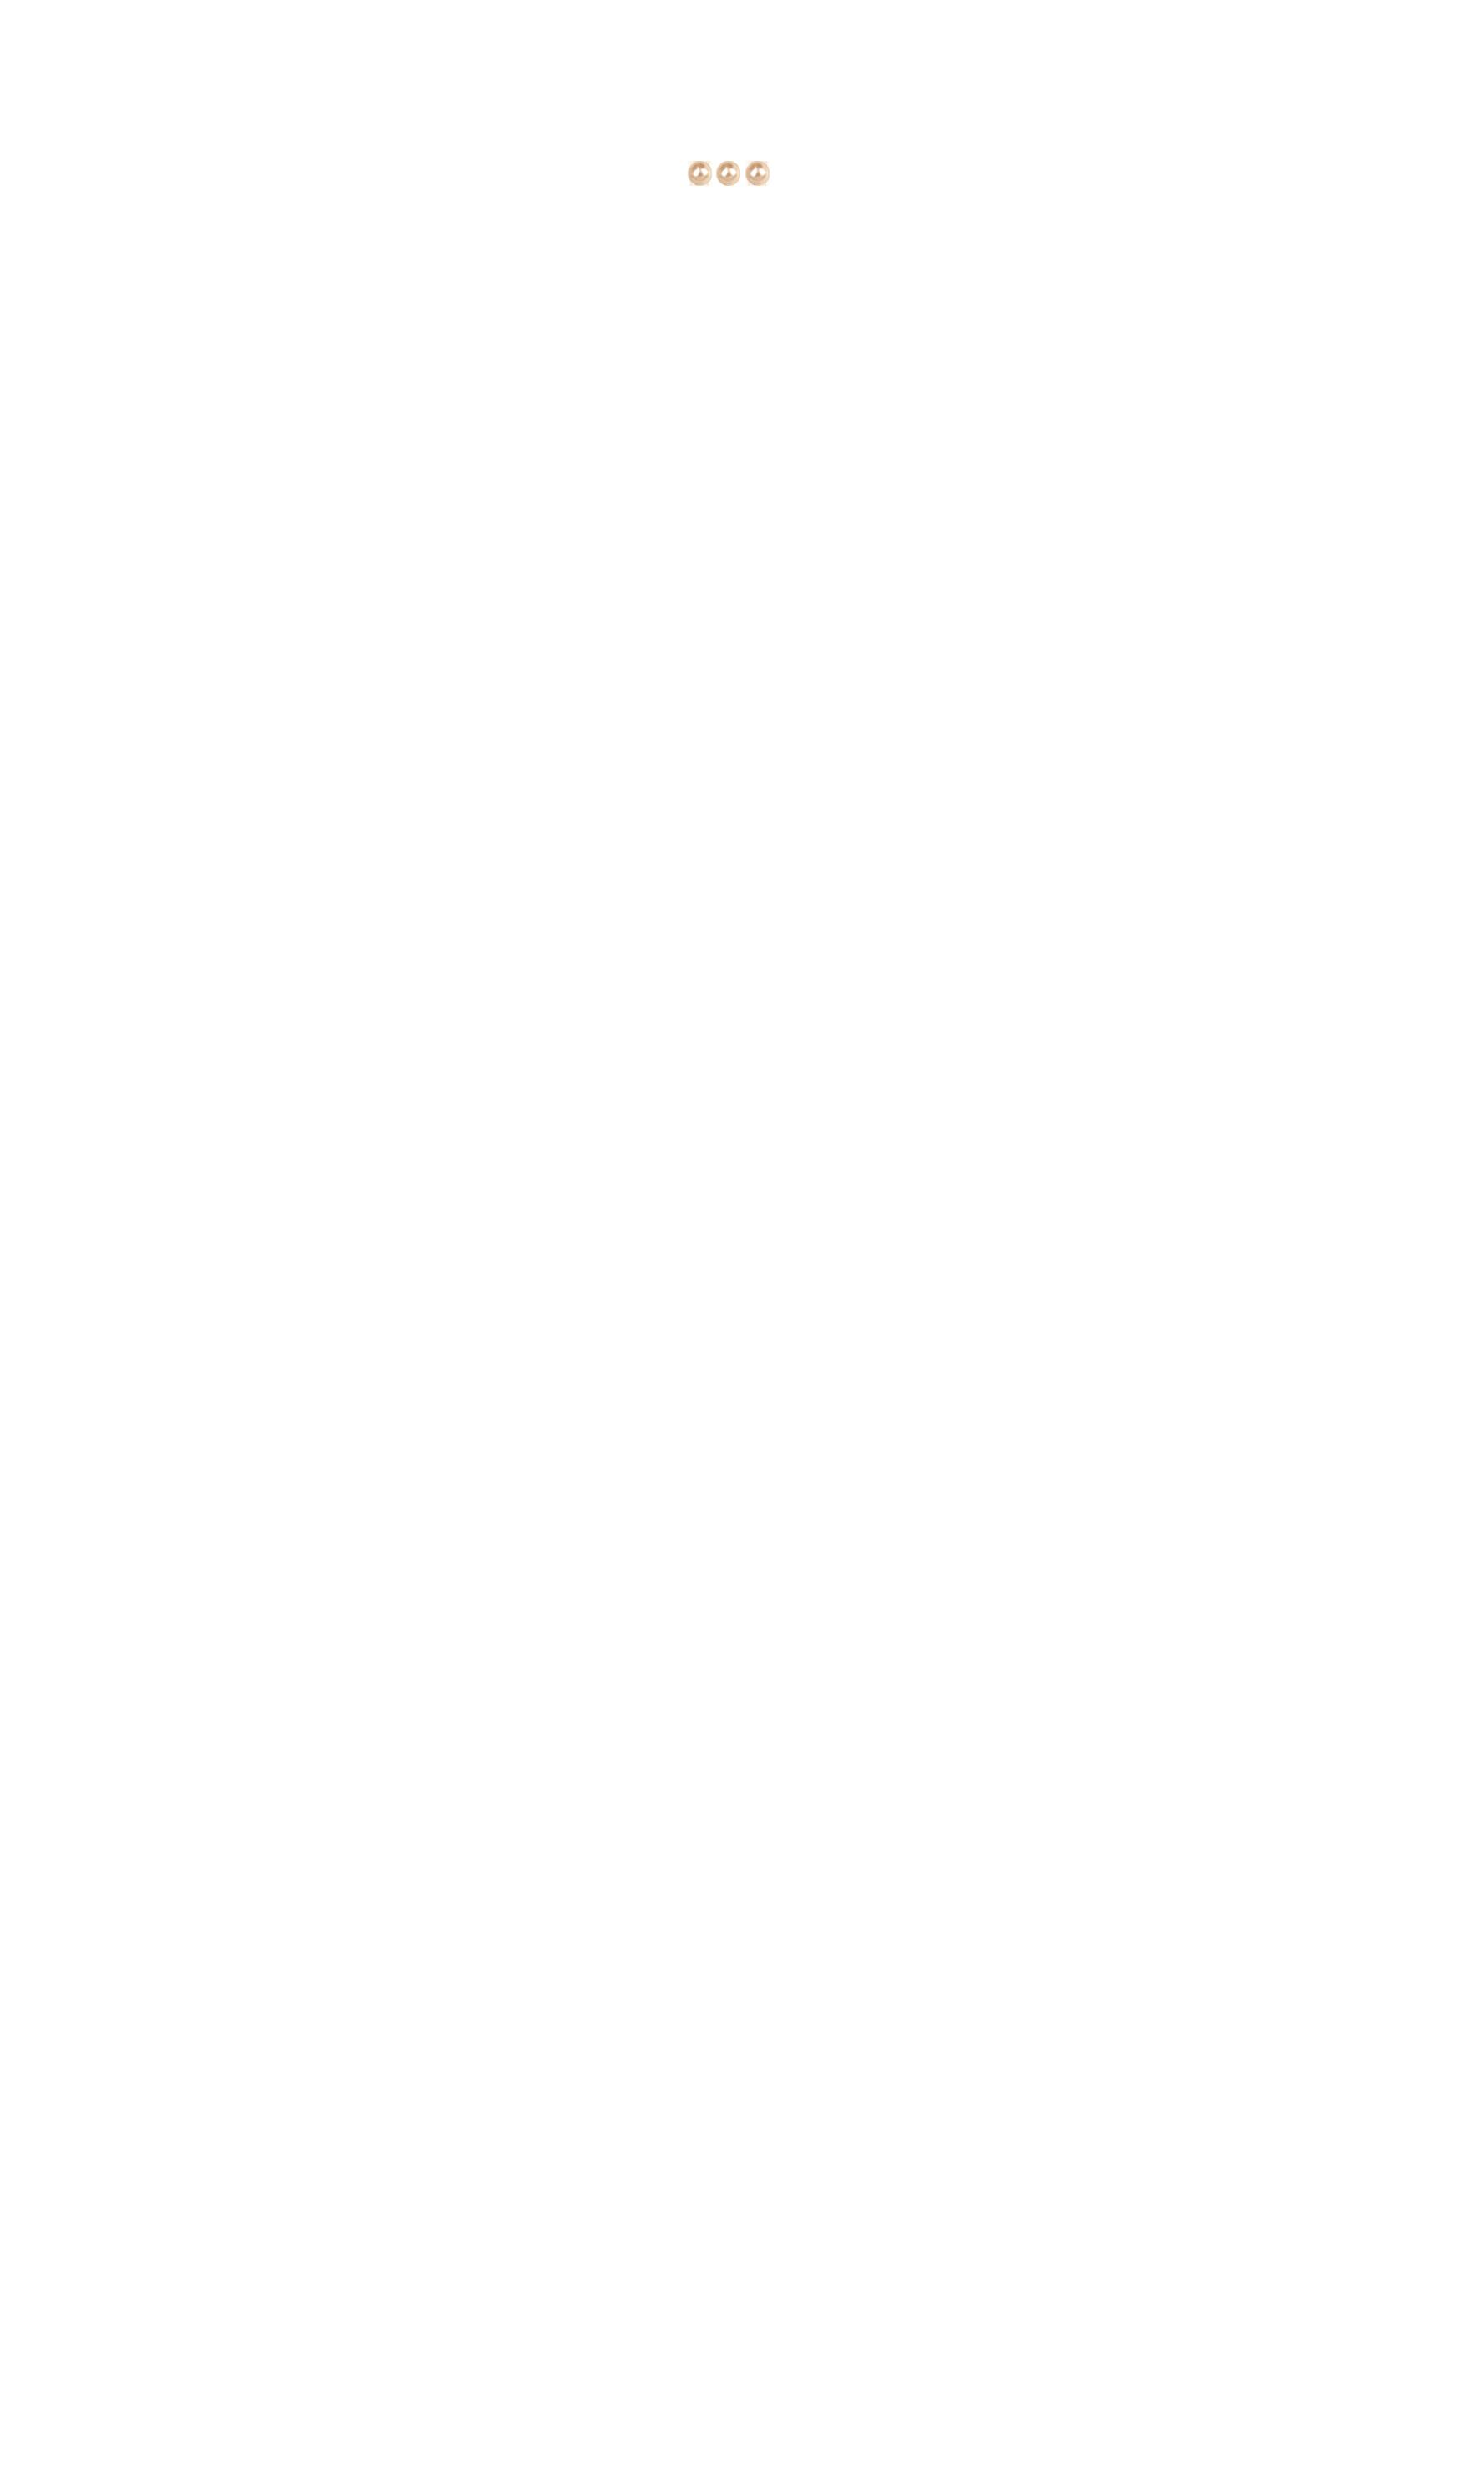 perle Swarovski x 3 rose poudré 6 mm